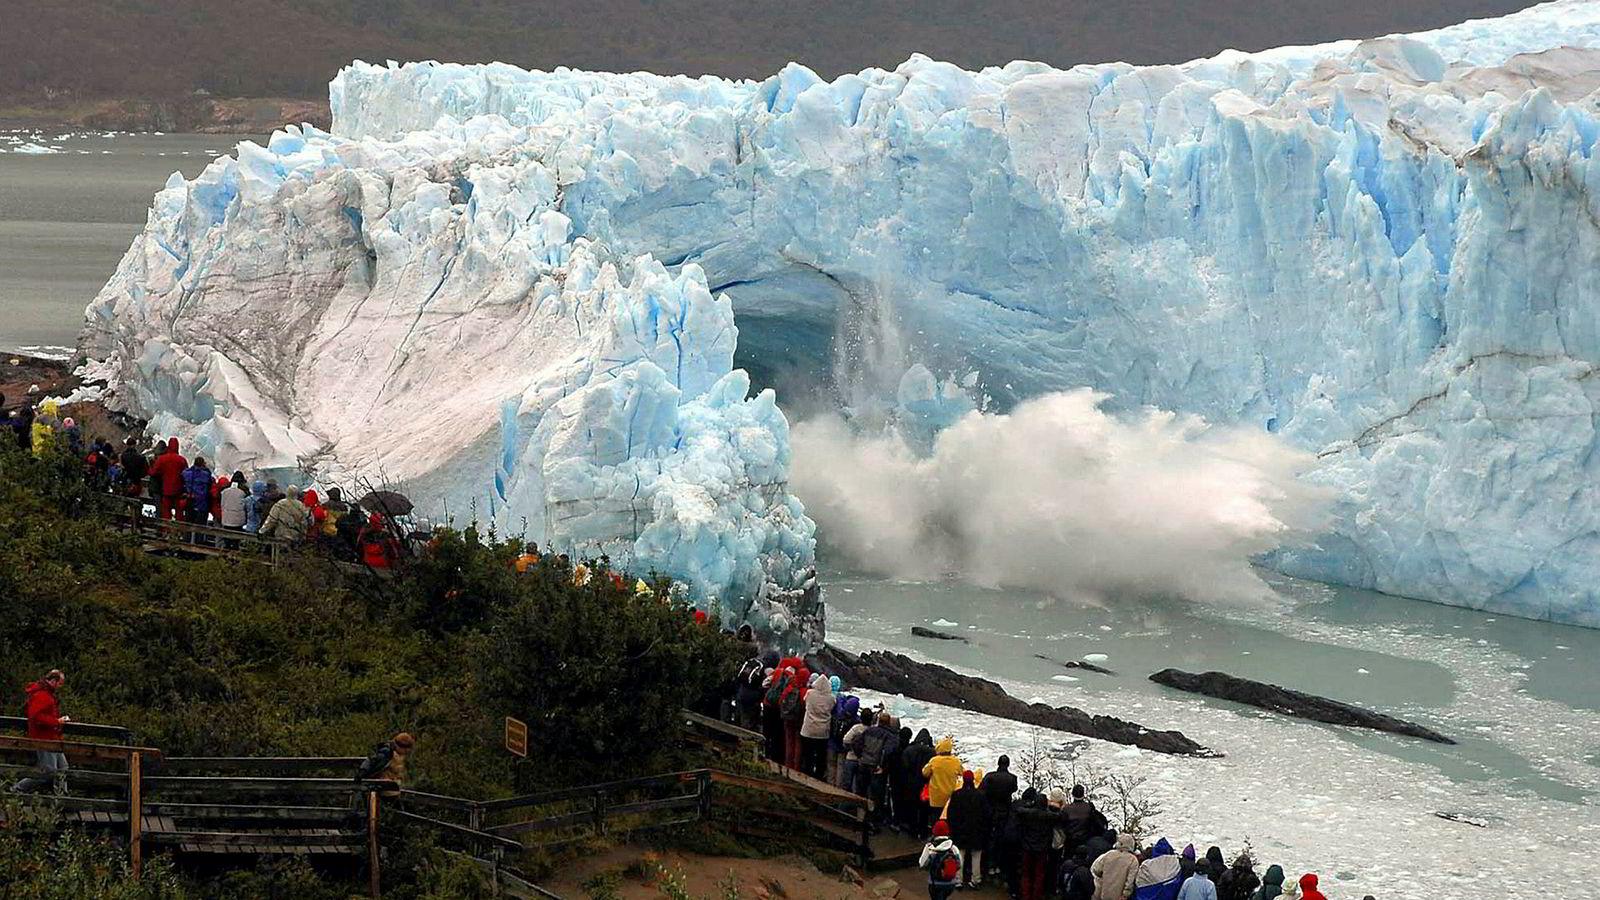 Vi må verne mer av naturen, sier filantropen Hansjörg Wyss. Bildet viser Perito Moreno-isbreen ved byen El Calafate i Patagonia-provinsen i sørlige Argentina.